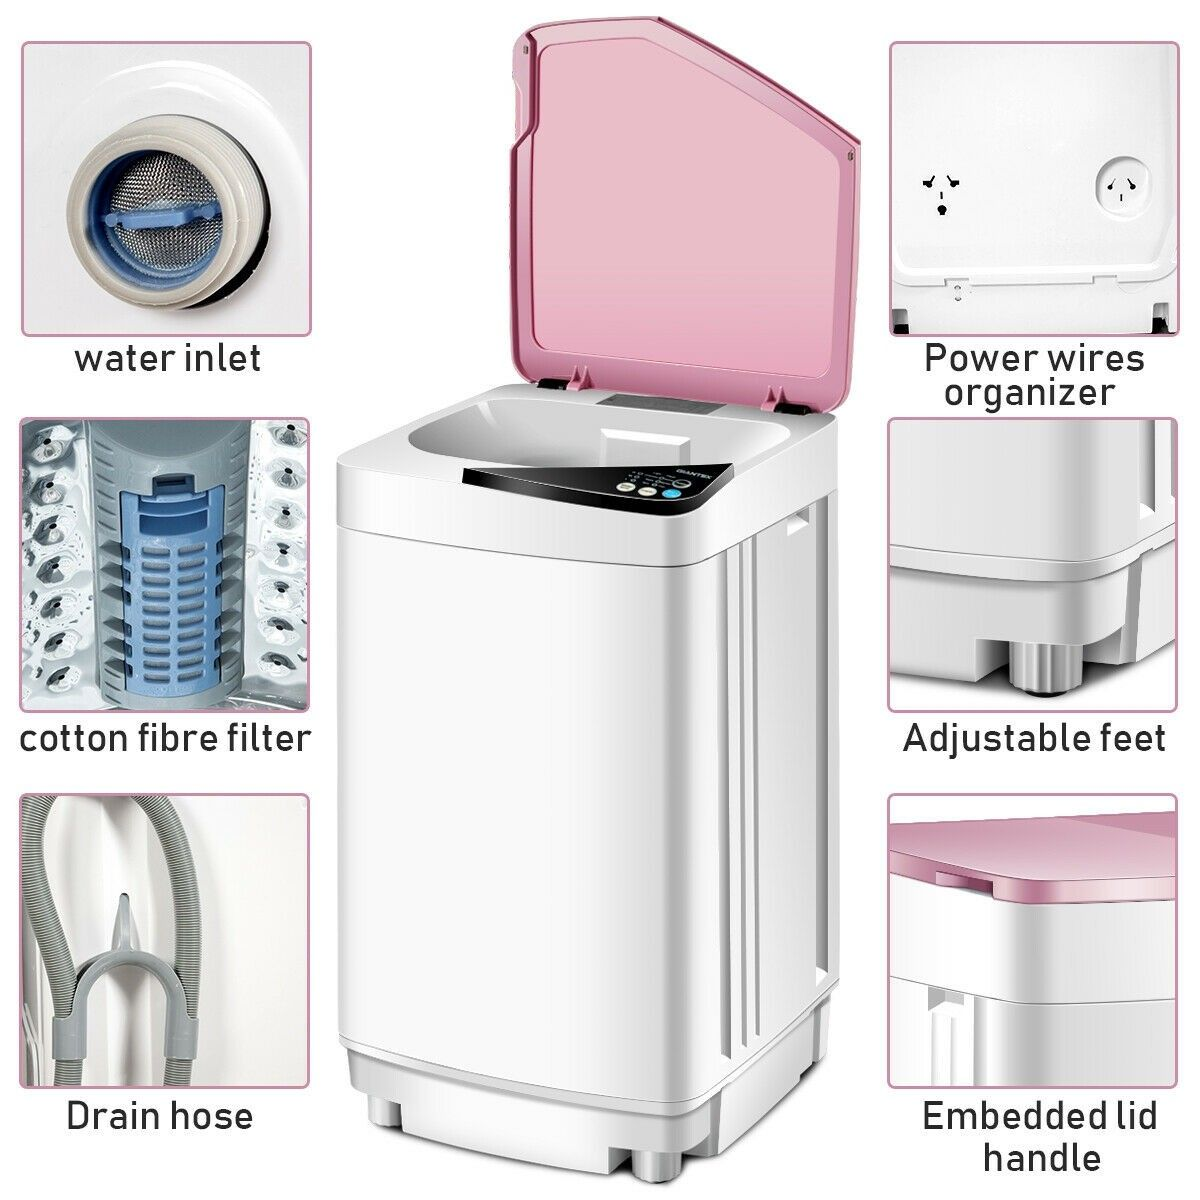 Full Automatic Washing Machine 10 Lbs Washer Spinner Germicidal Automatic Washing Machine Portable Washer And Dryer Washing Machine